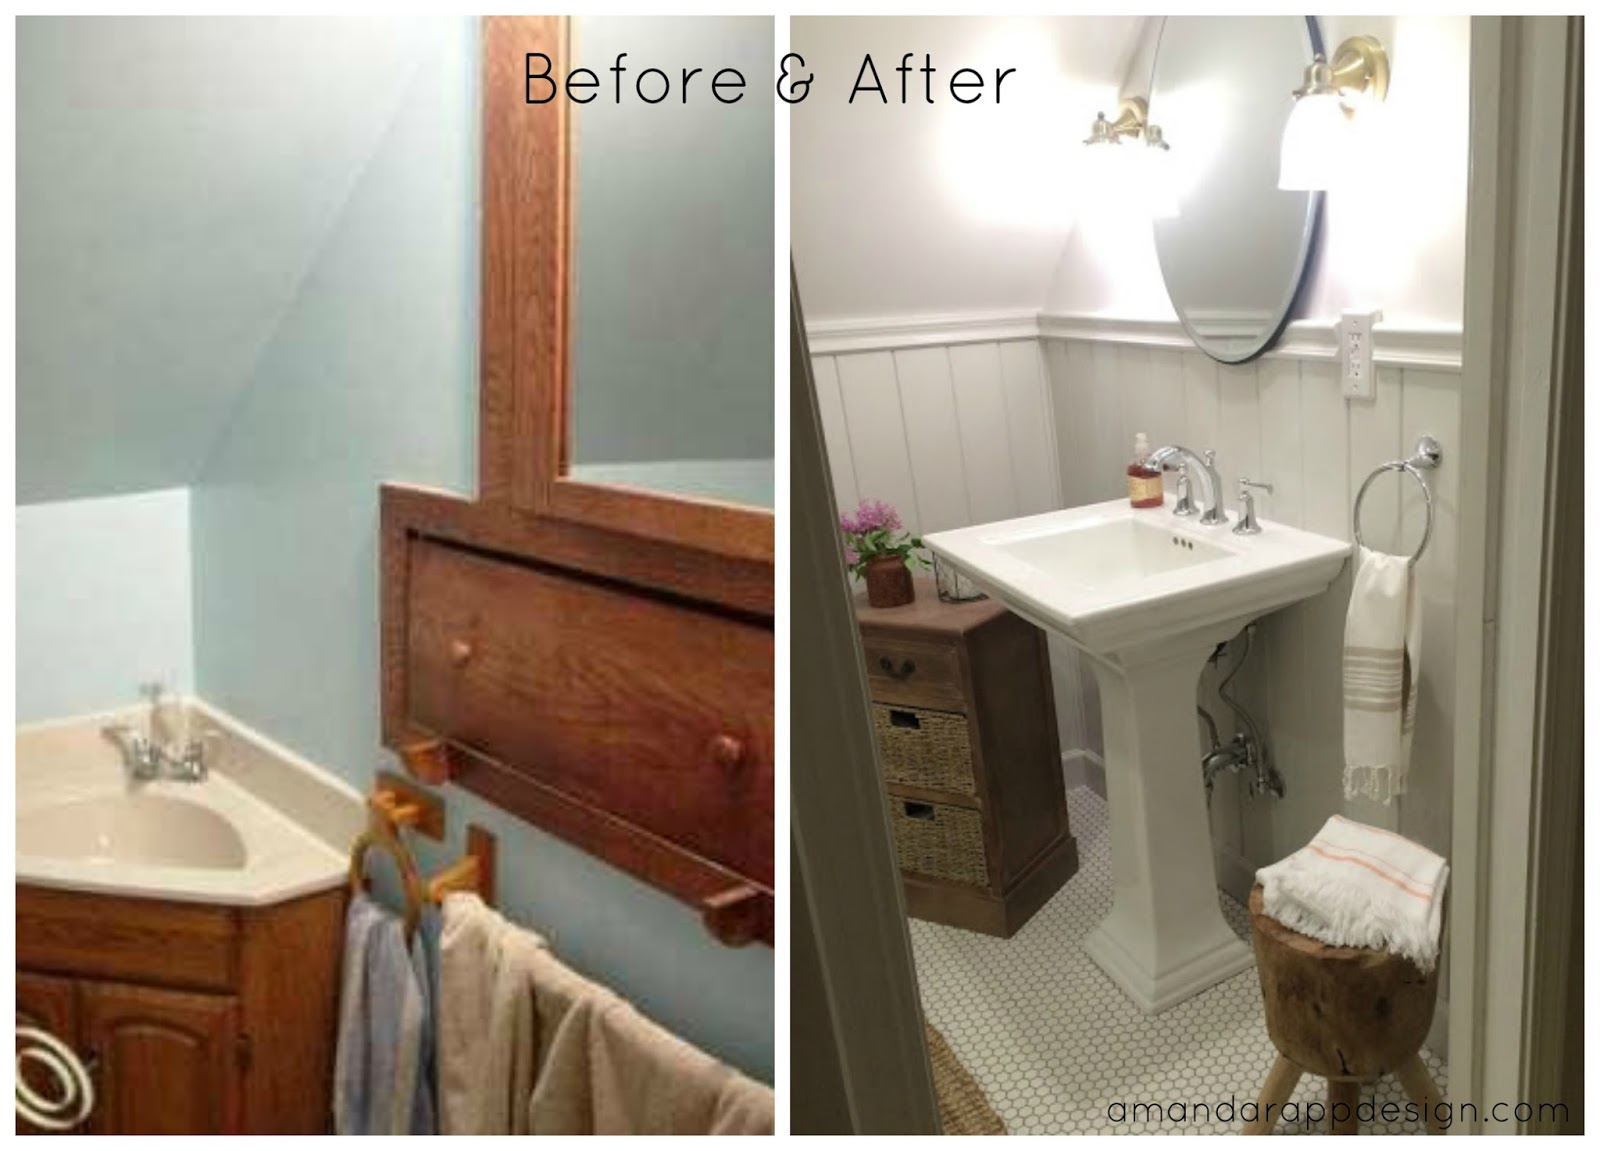 Amanda Rapp Design: Finished Classic Cottagey Bathroom